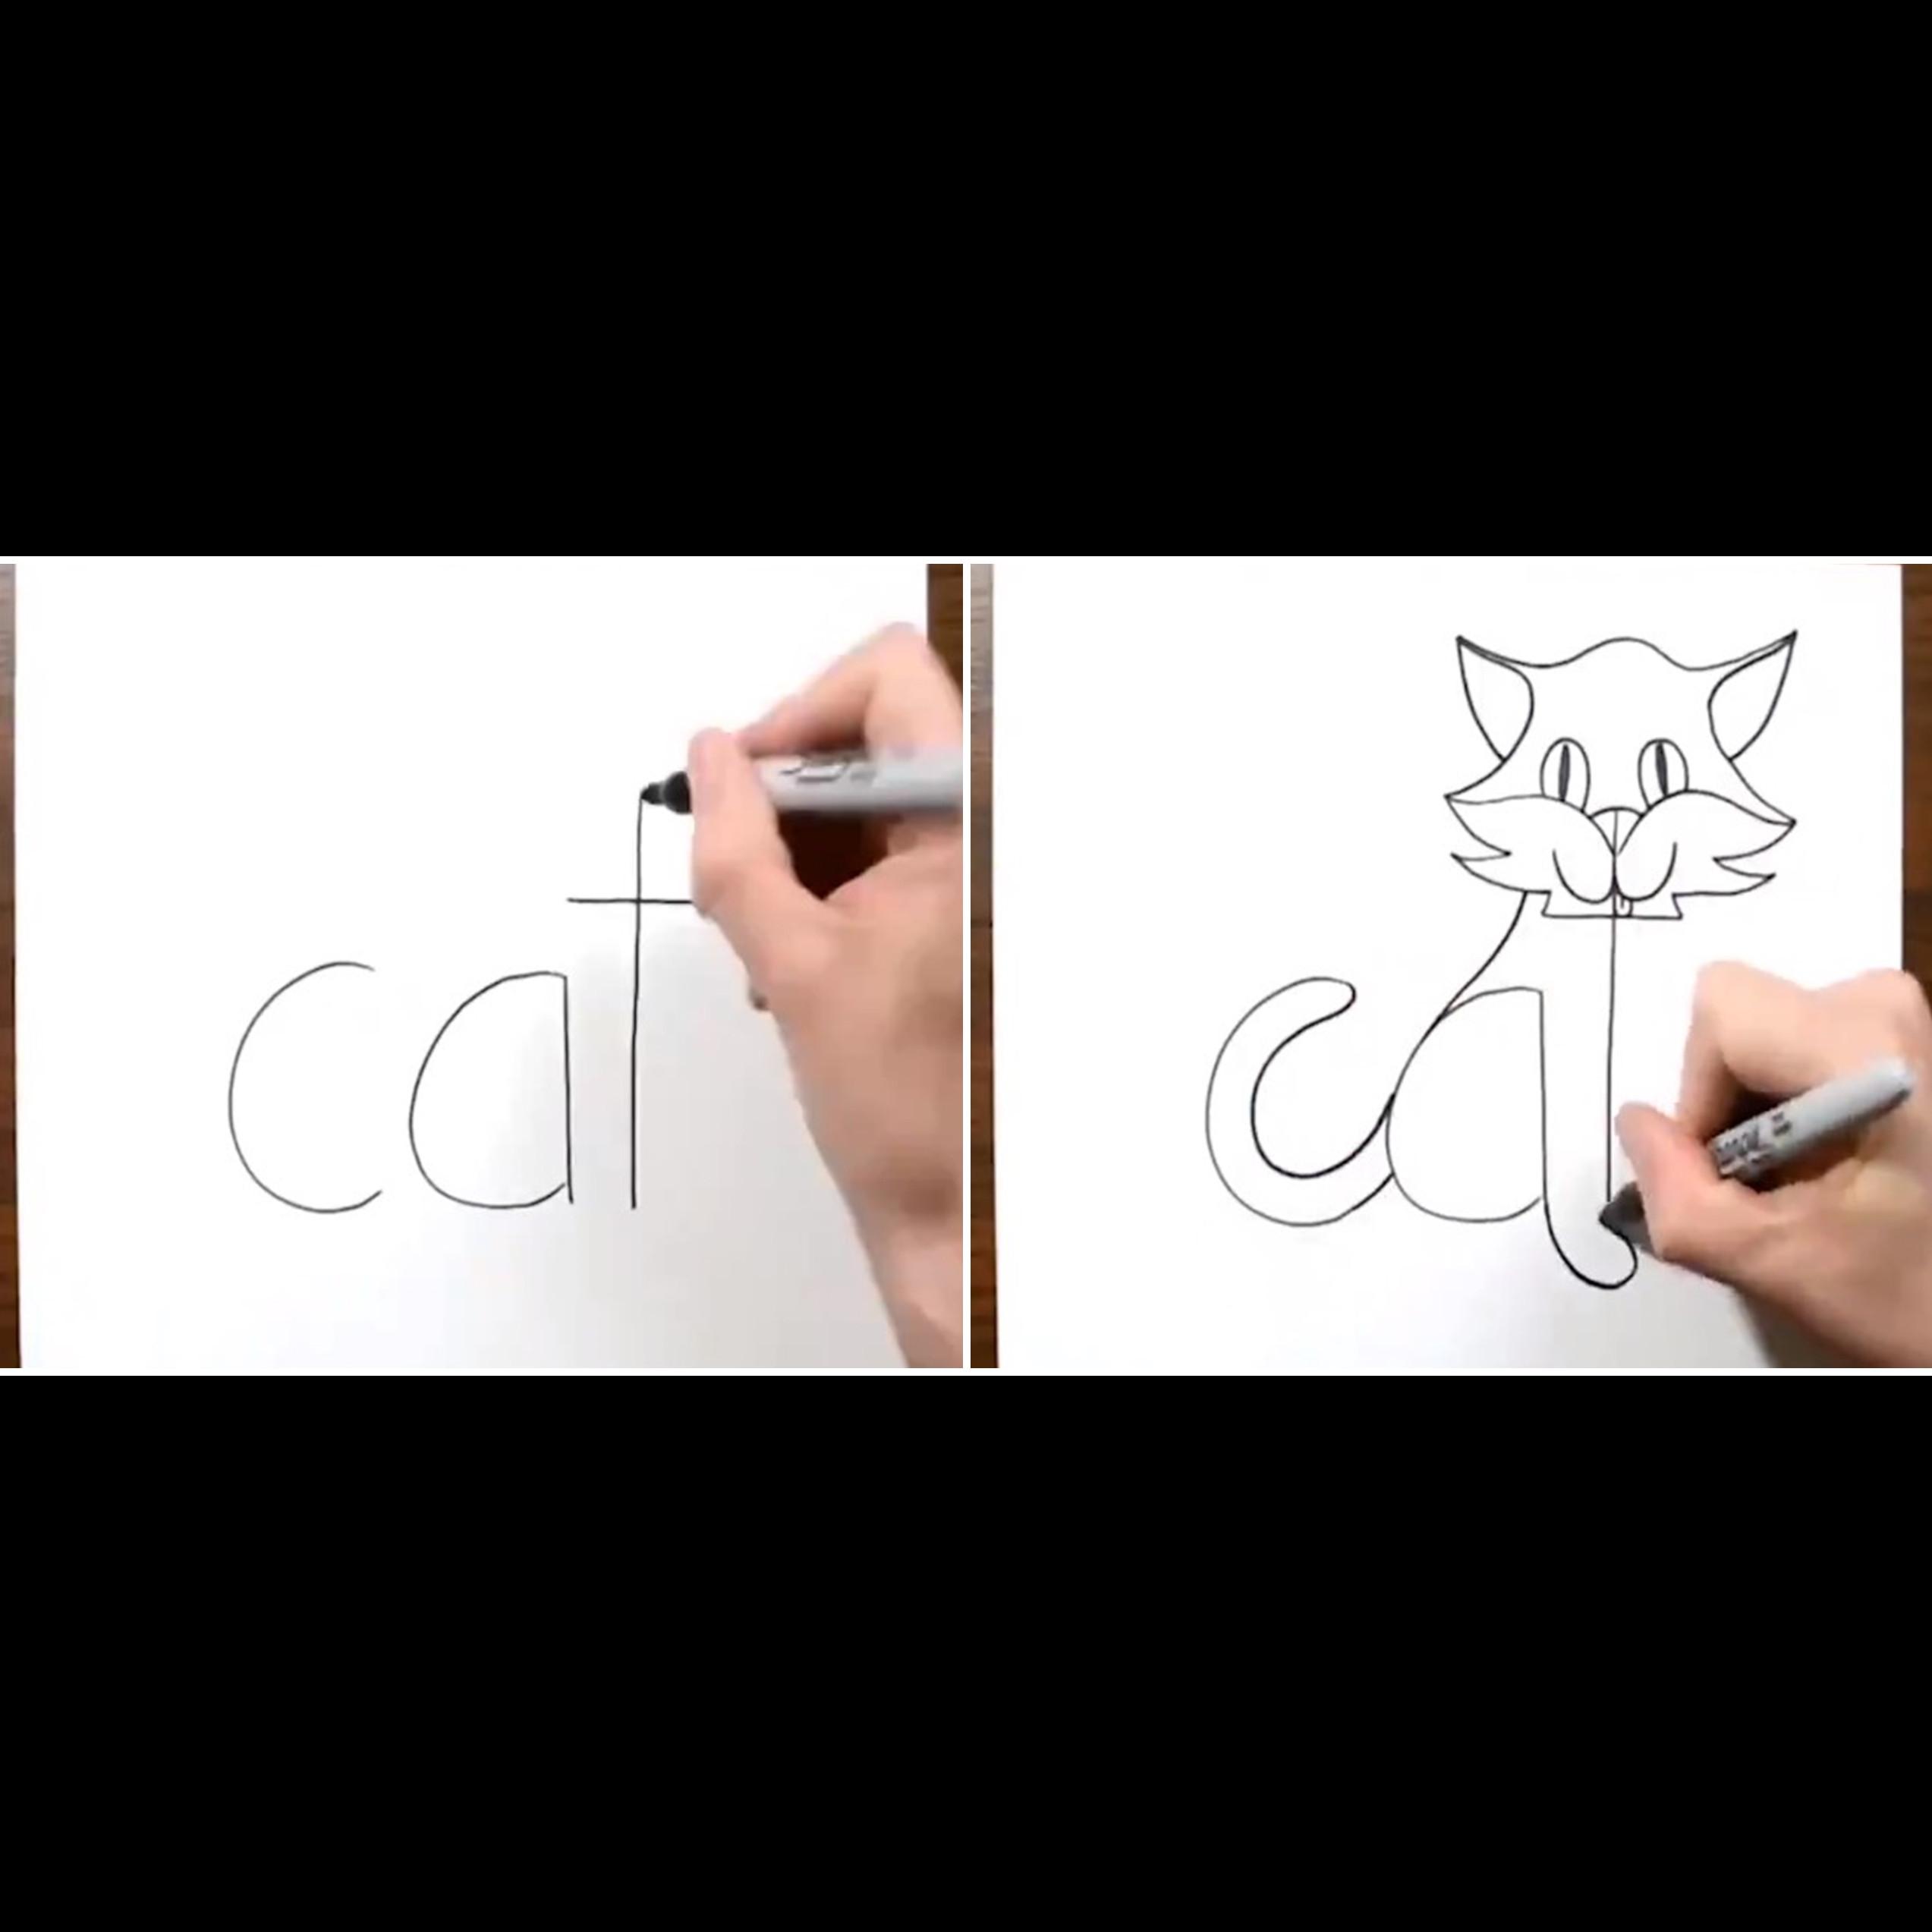 6 Gambar keren dibuat dari kerangka kata, kreatifnya bikin takjub